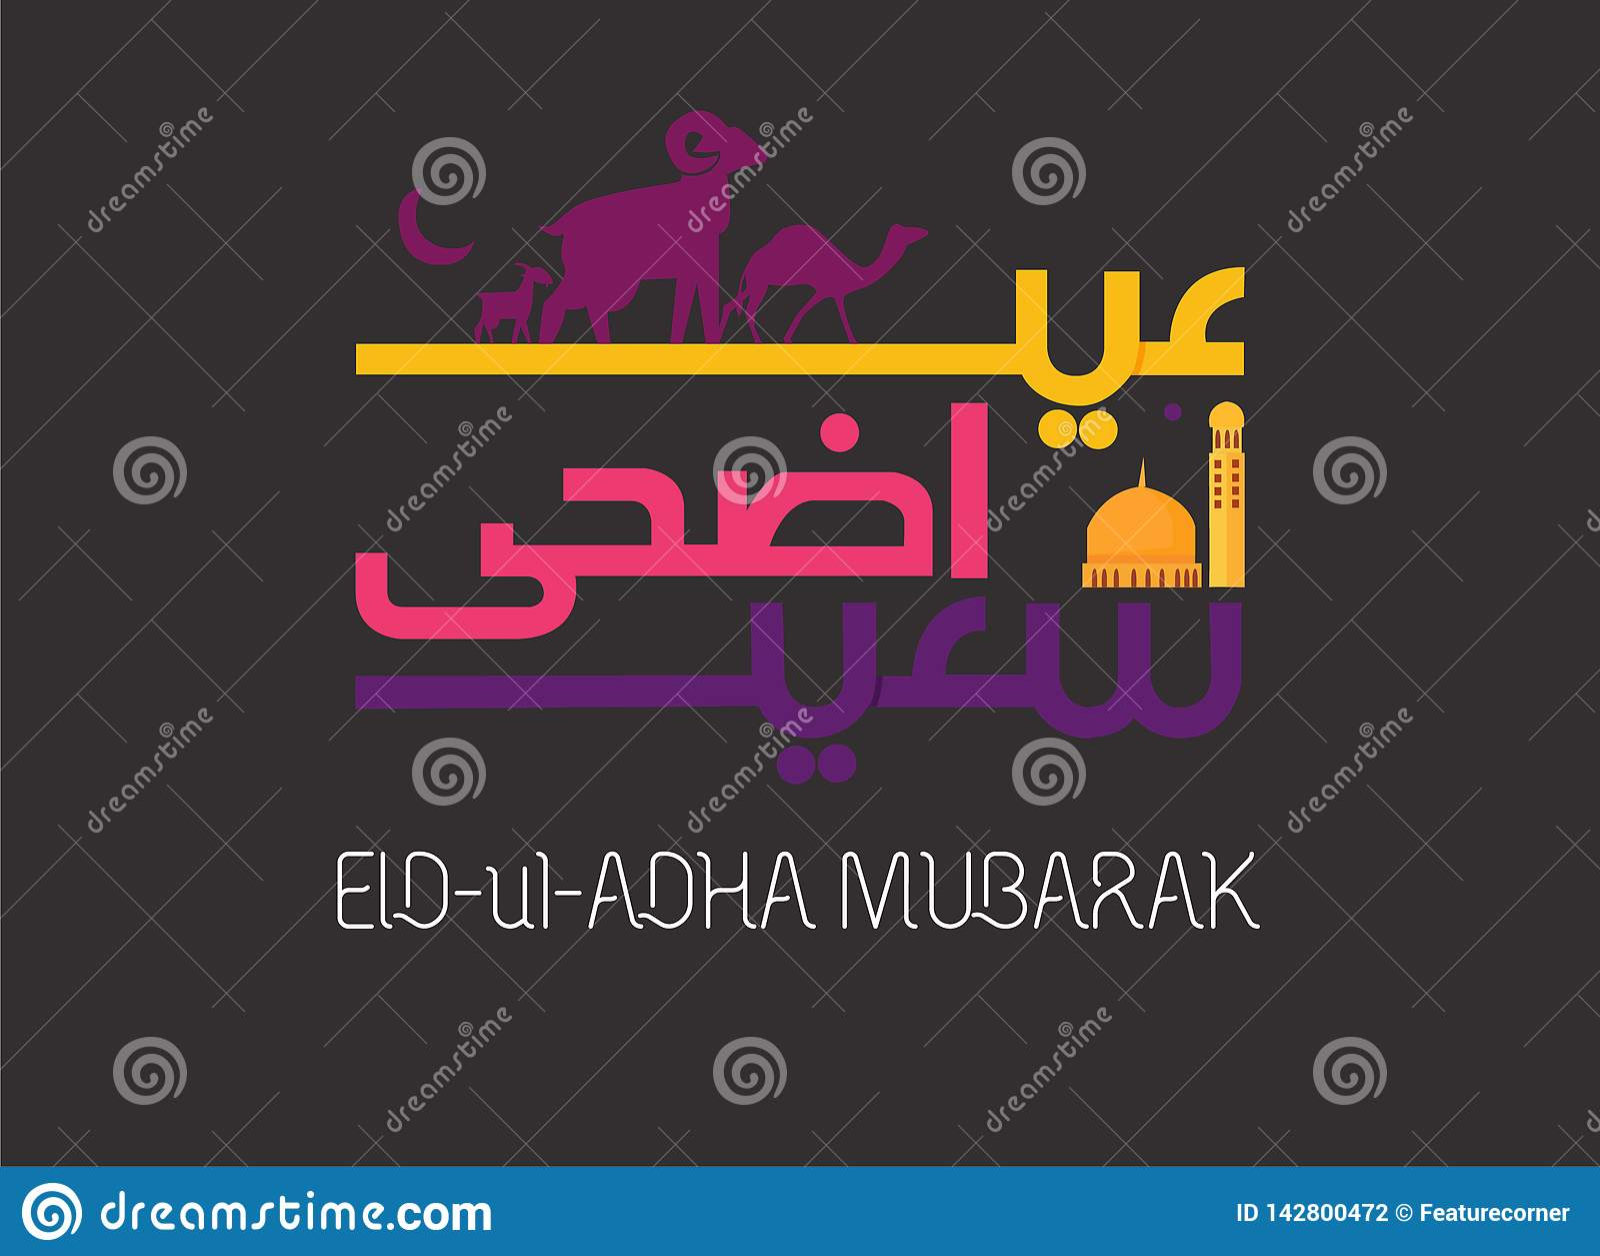 Eid Mubarak Greeting Card Illustration Eid Ul Adha Islamic Festival